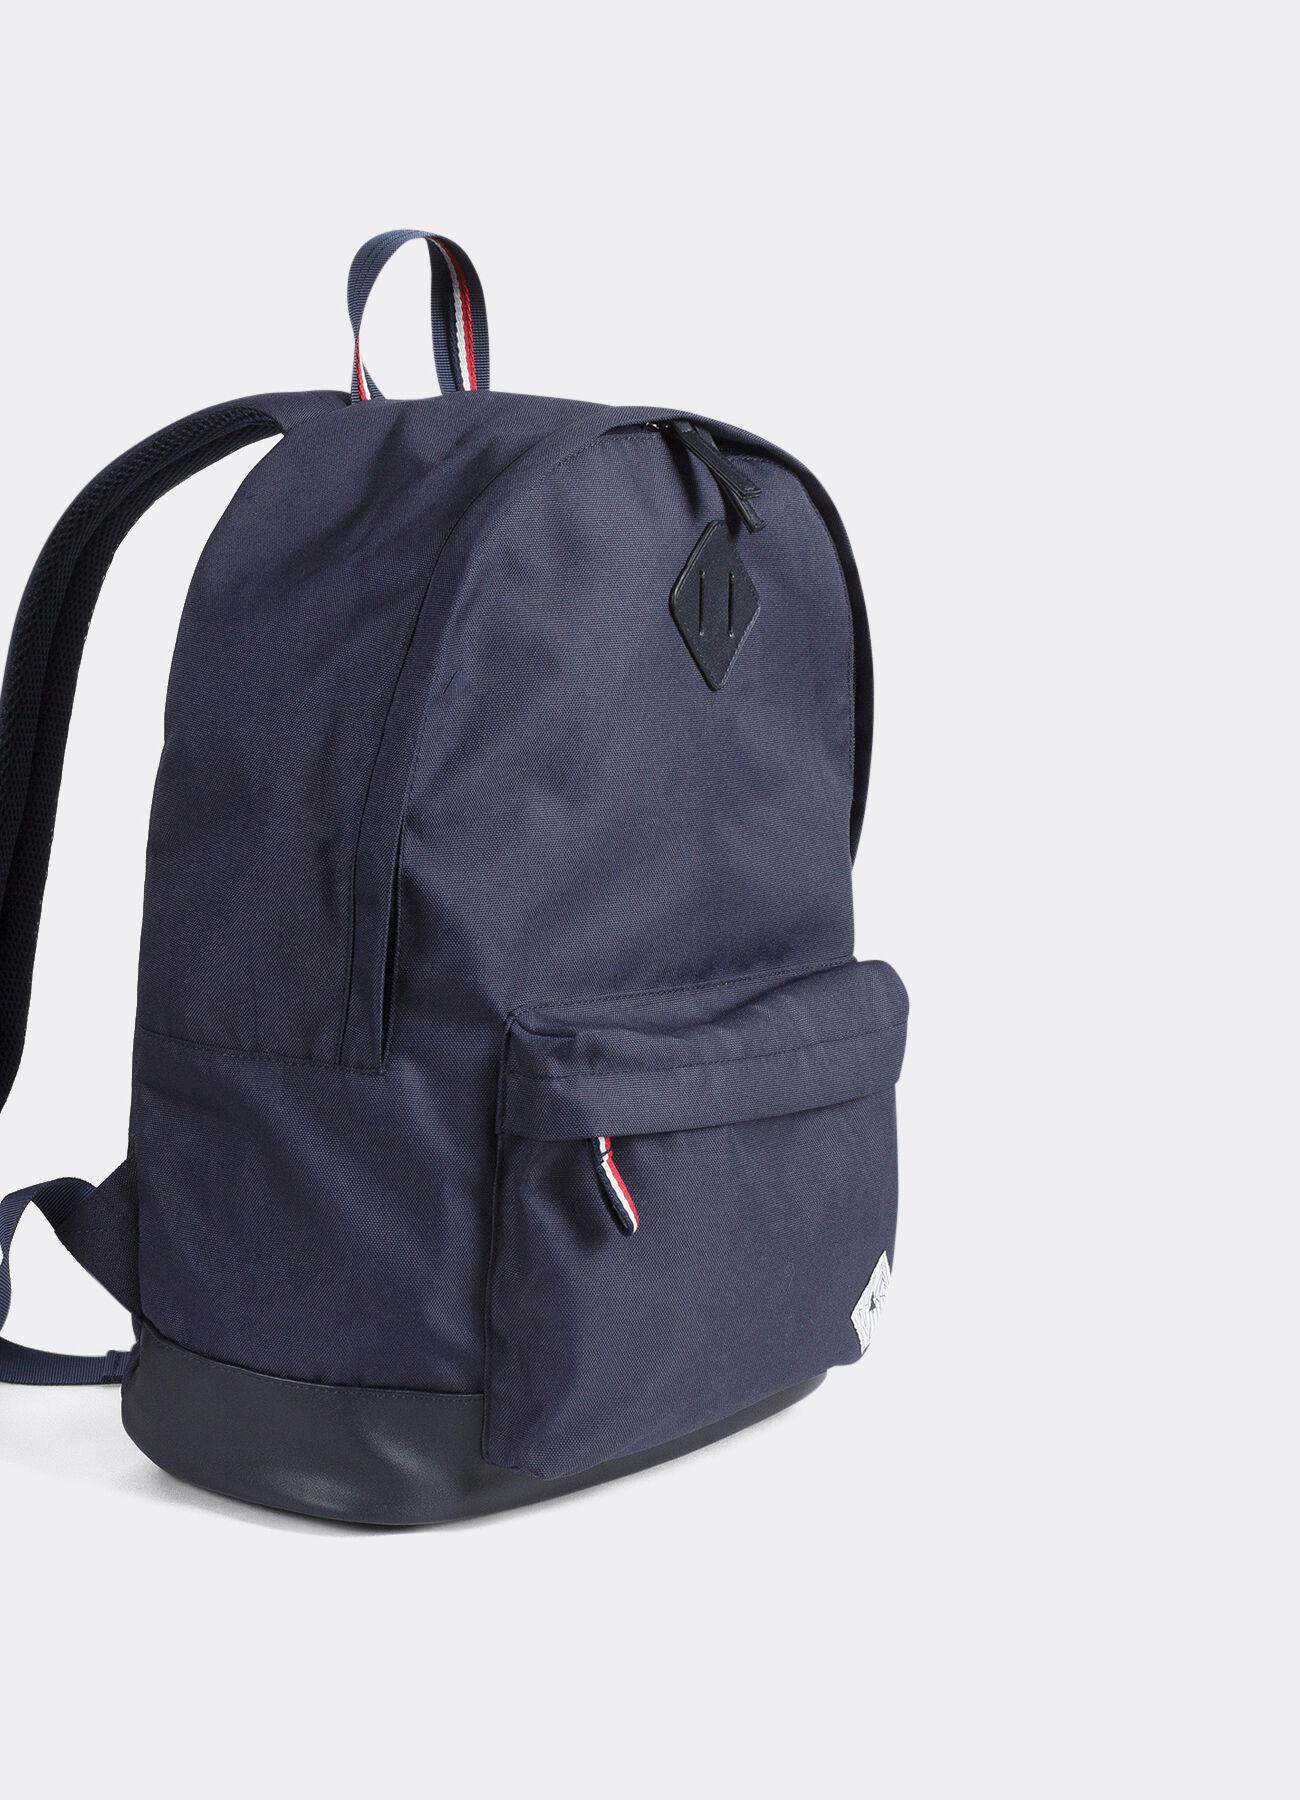 sac dos tricolore bleu marine fonc homme jules. Black Bedroom Furniture Sets. Home Design Ideas